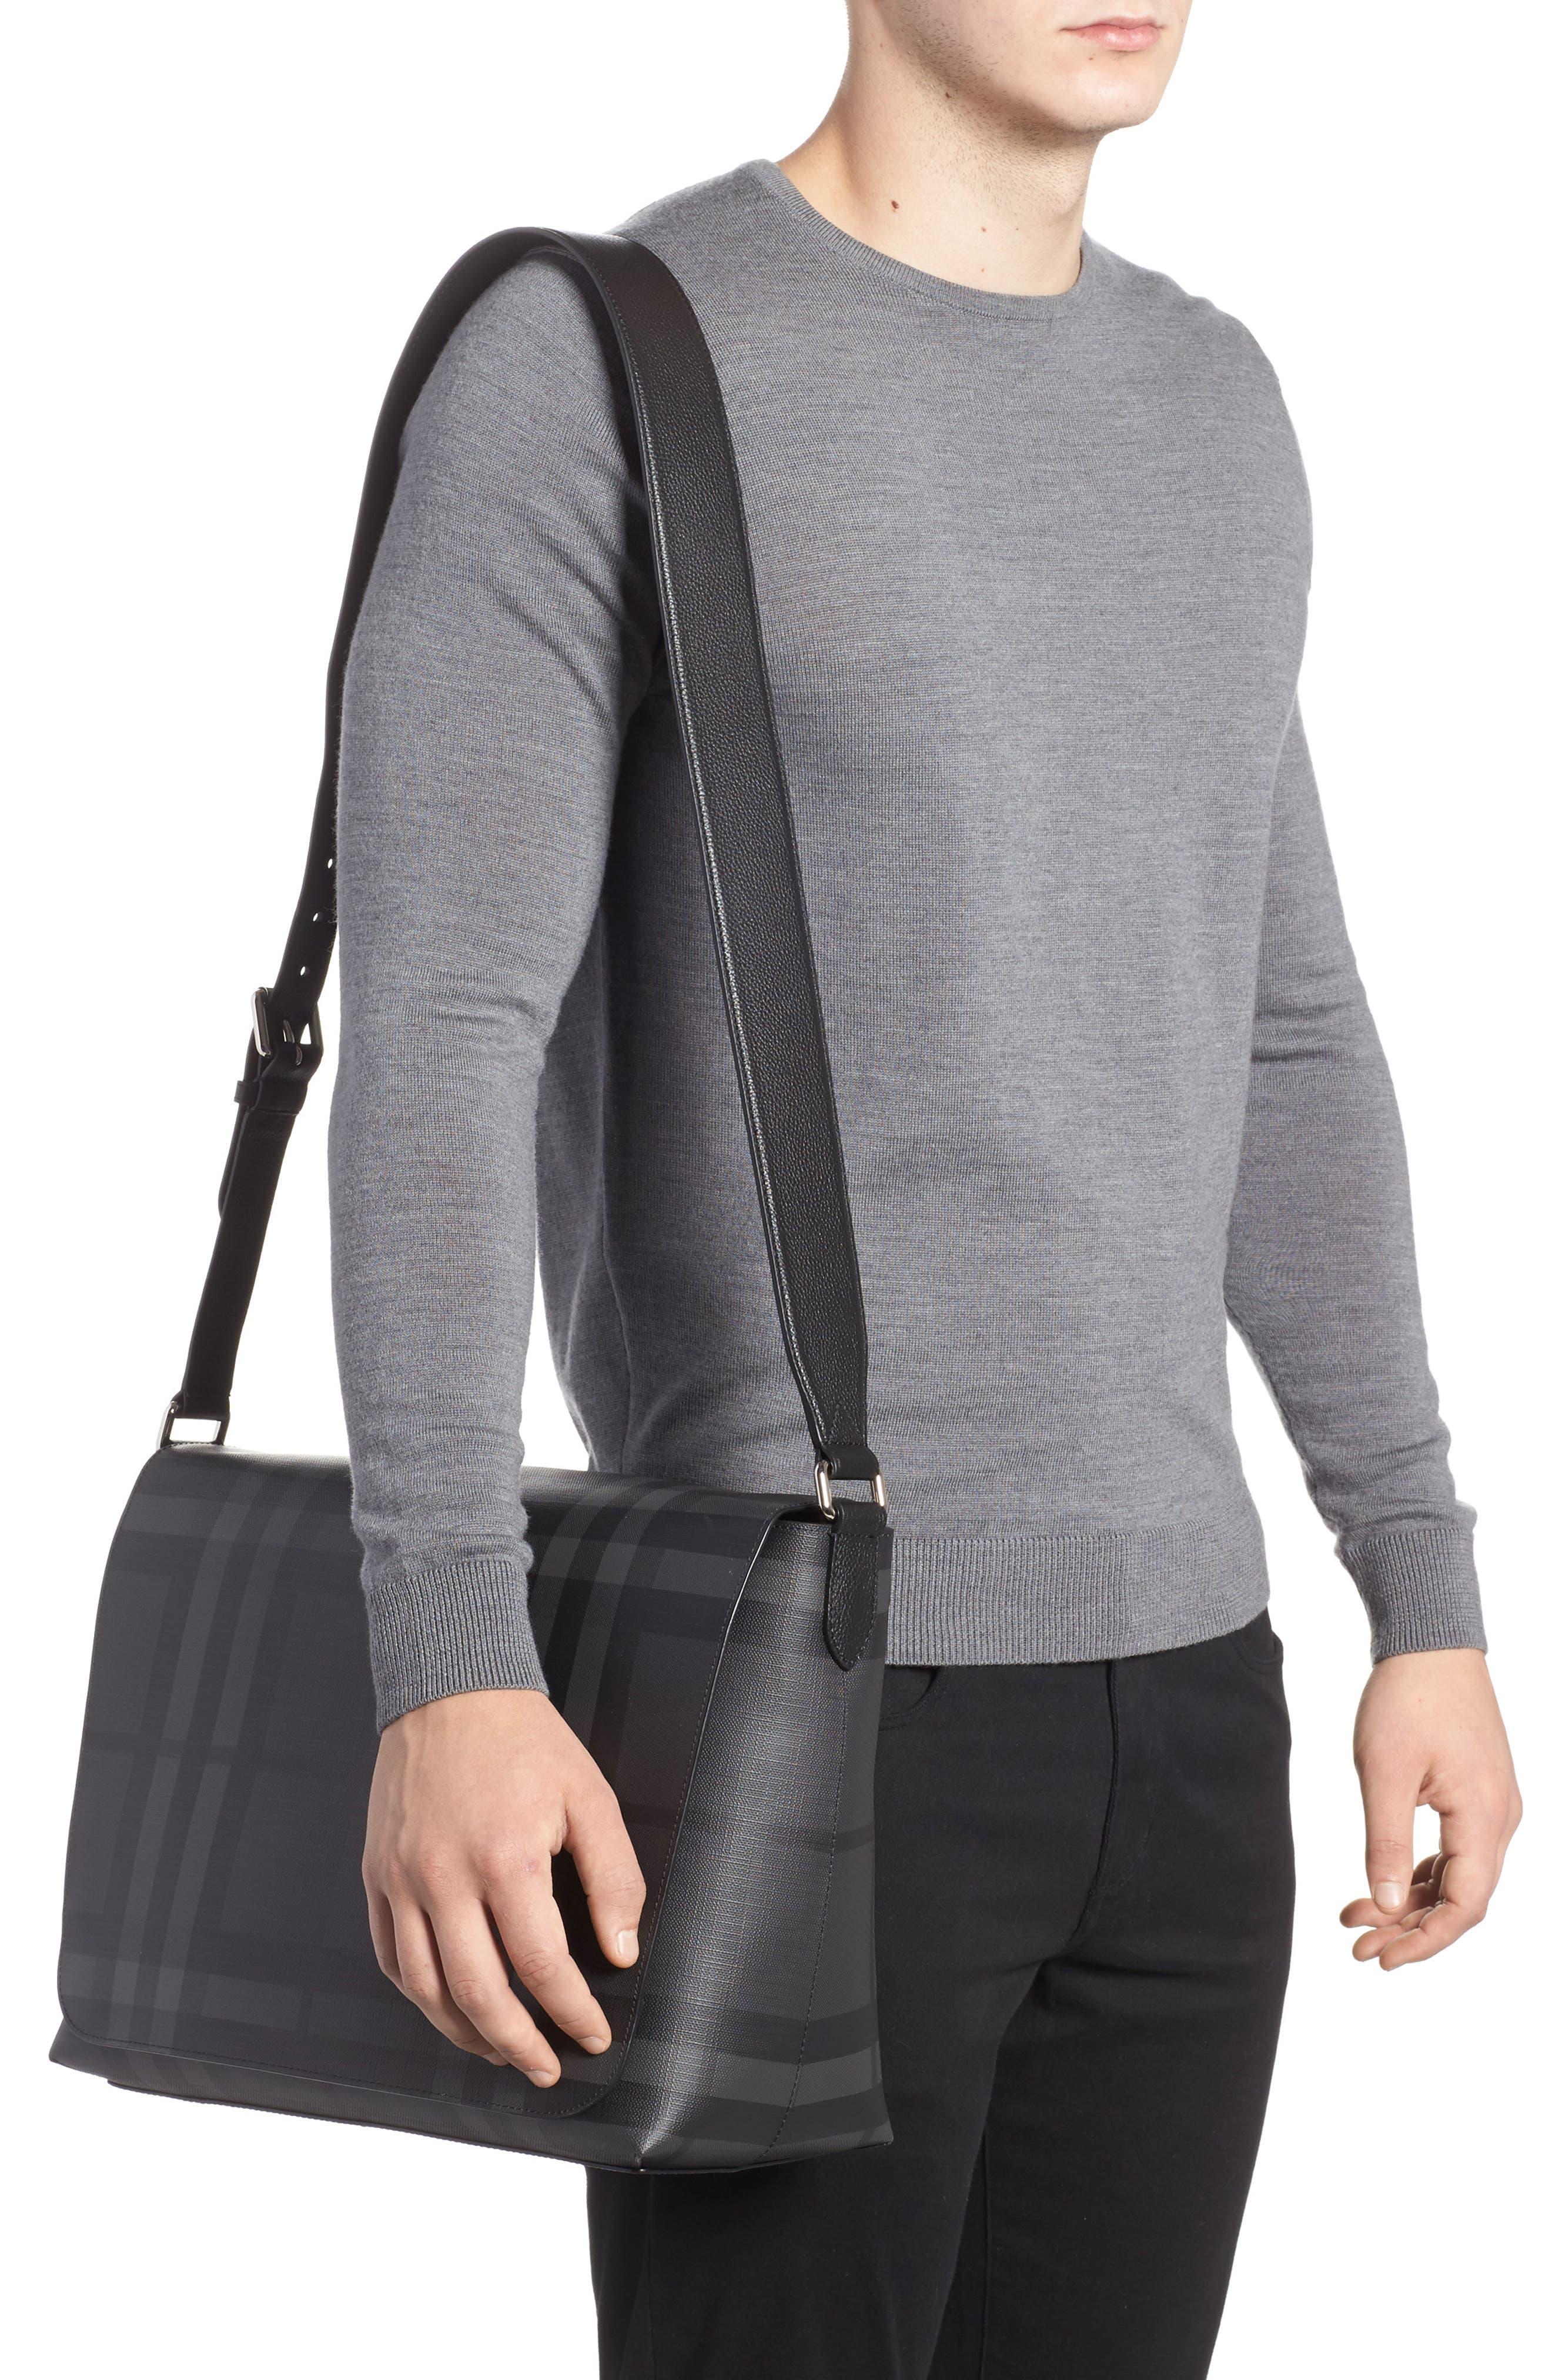 London Check Messenger Bag,                             Alternate thumbnail 2, color,                             Charcoal/ Black